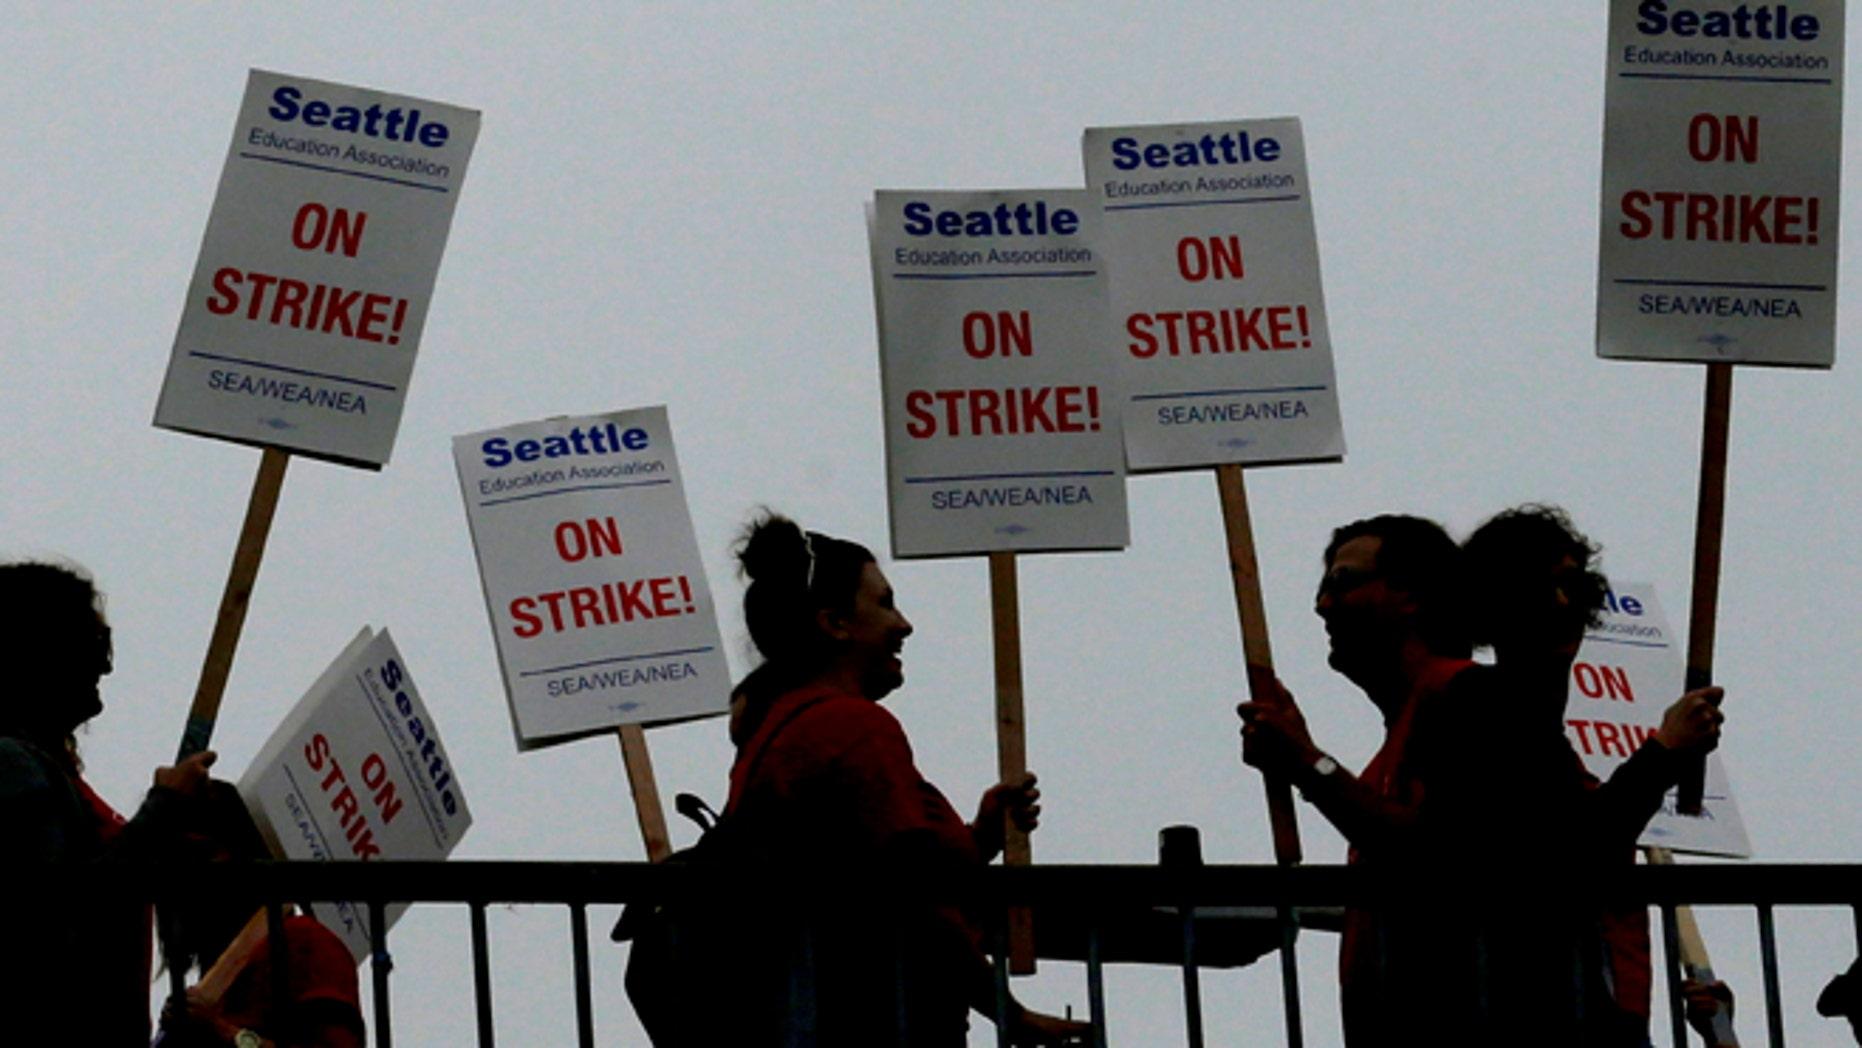 Sept 10: Striking Seattle School District teachers and other educators walk a picket line on a pedestrian overpass.